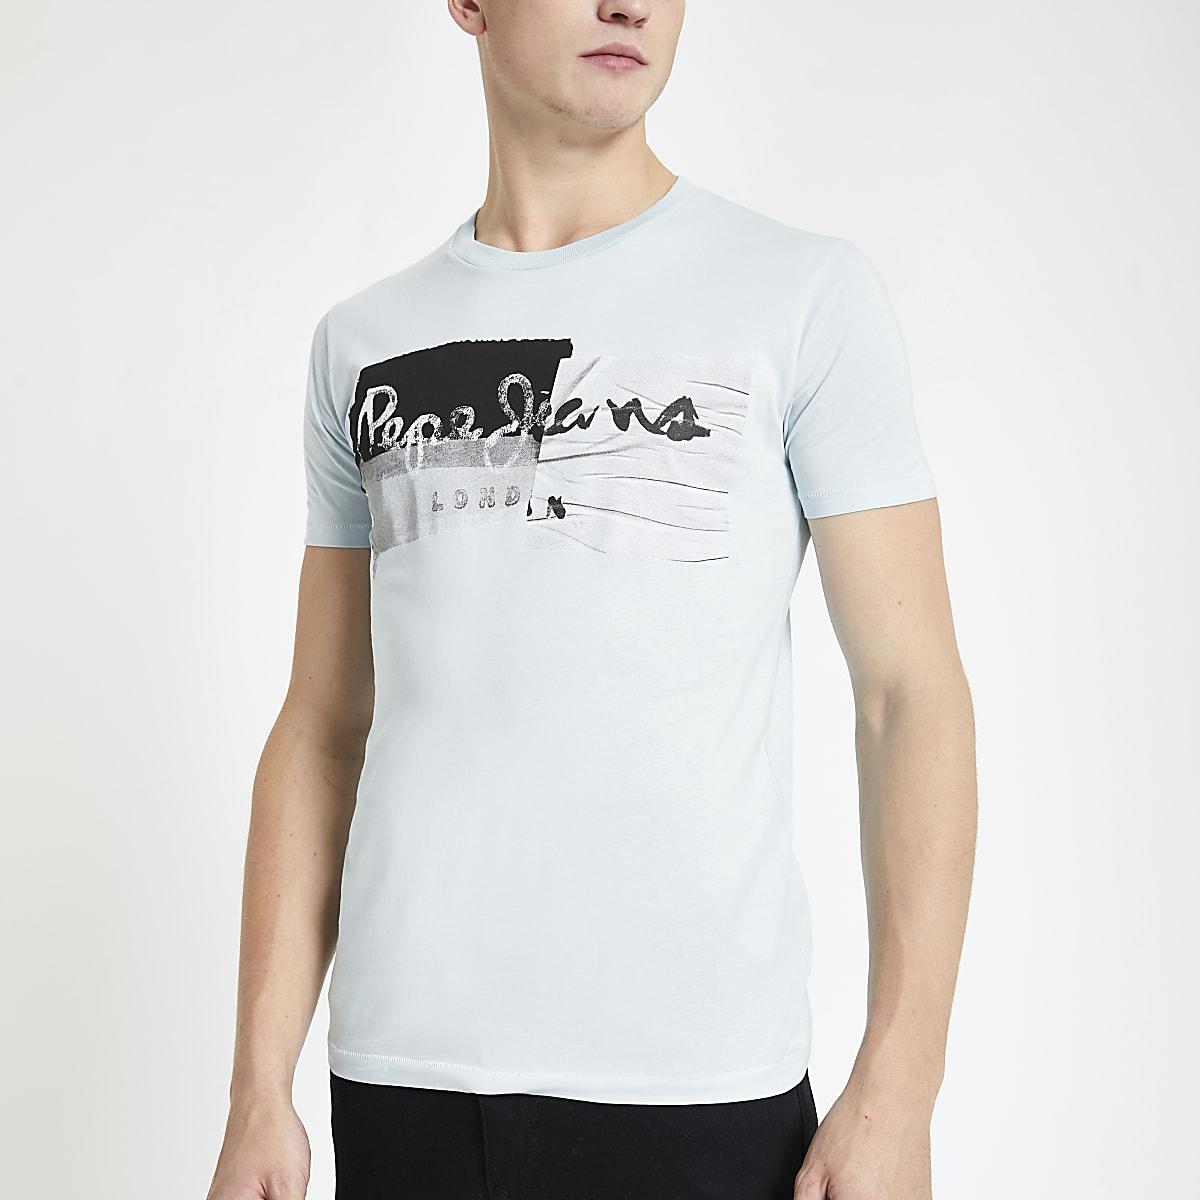 Pepe Jeans – T-shirt vert clair à logo